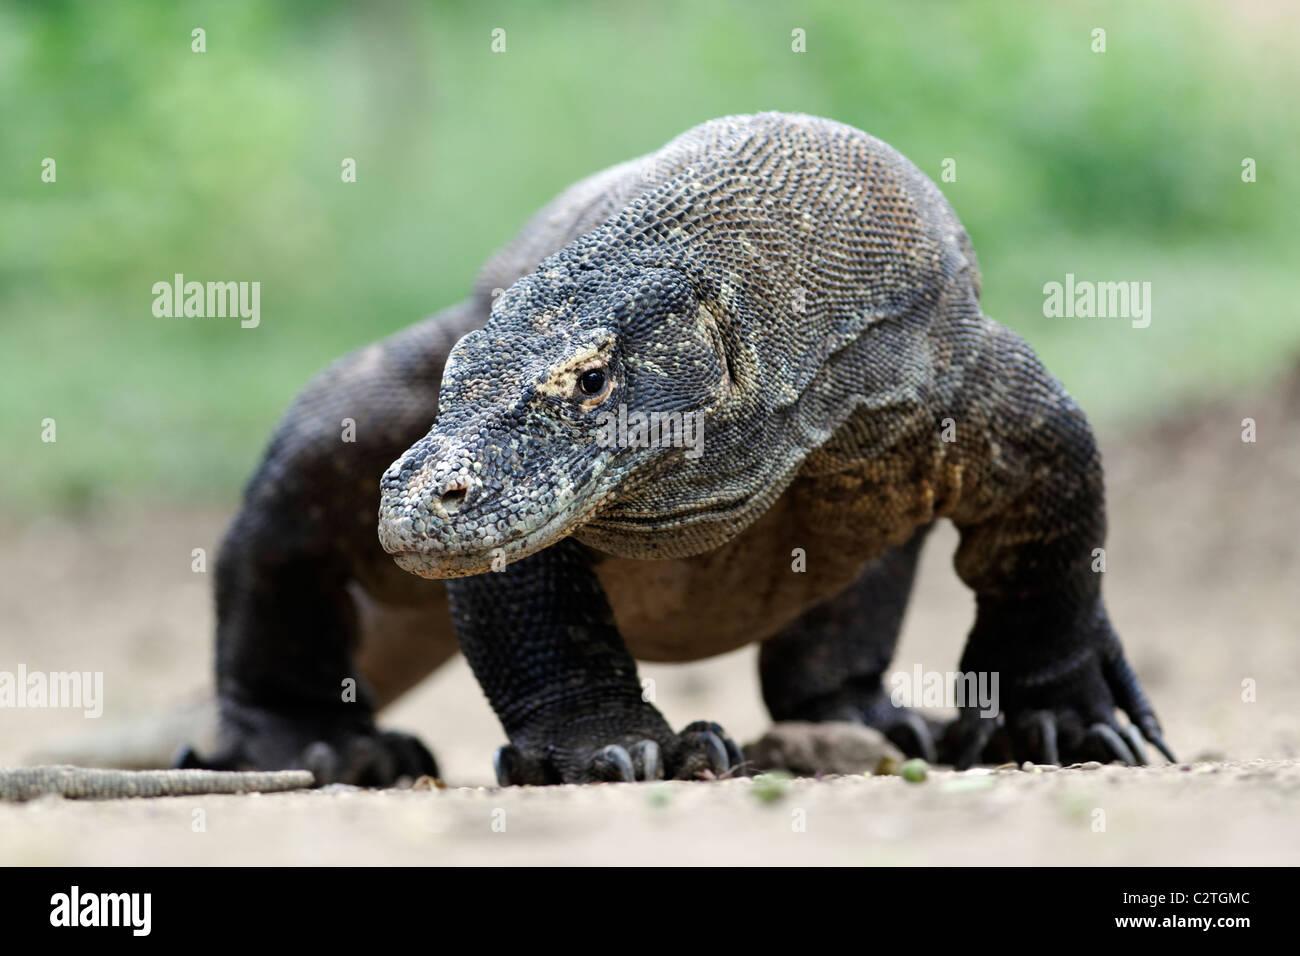 Drago di Komodo, Varanus komodoensis, singolo lizard sul pavimento, Komodo Indonesia, Marzo 2011 Immagini Stock